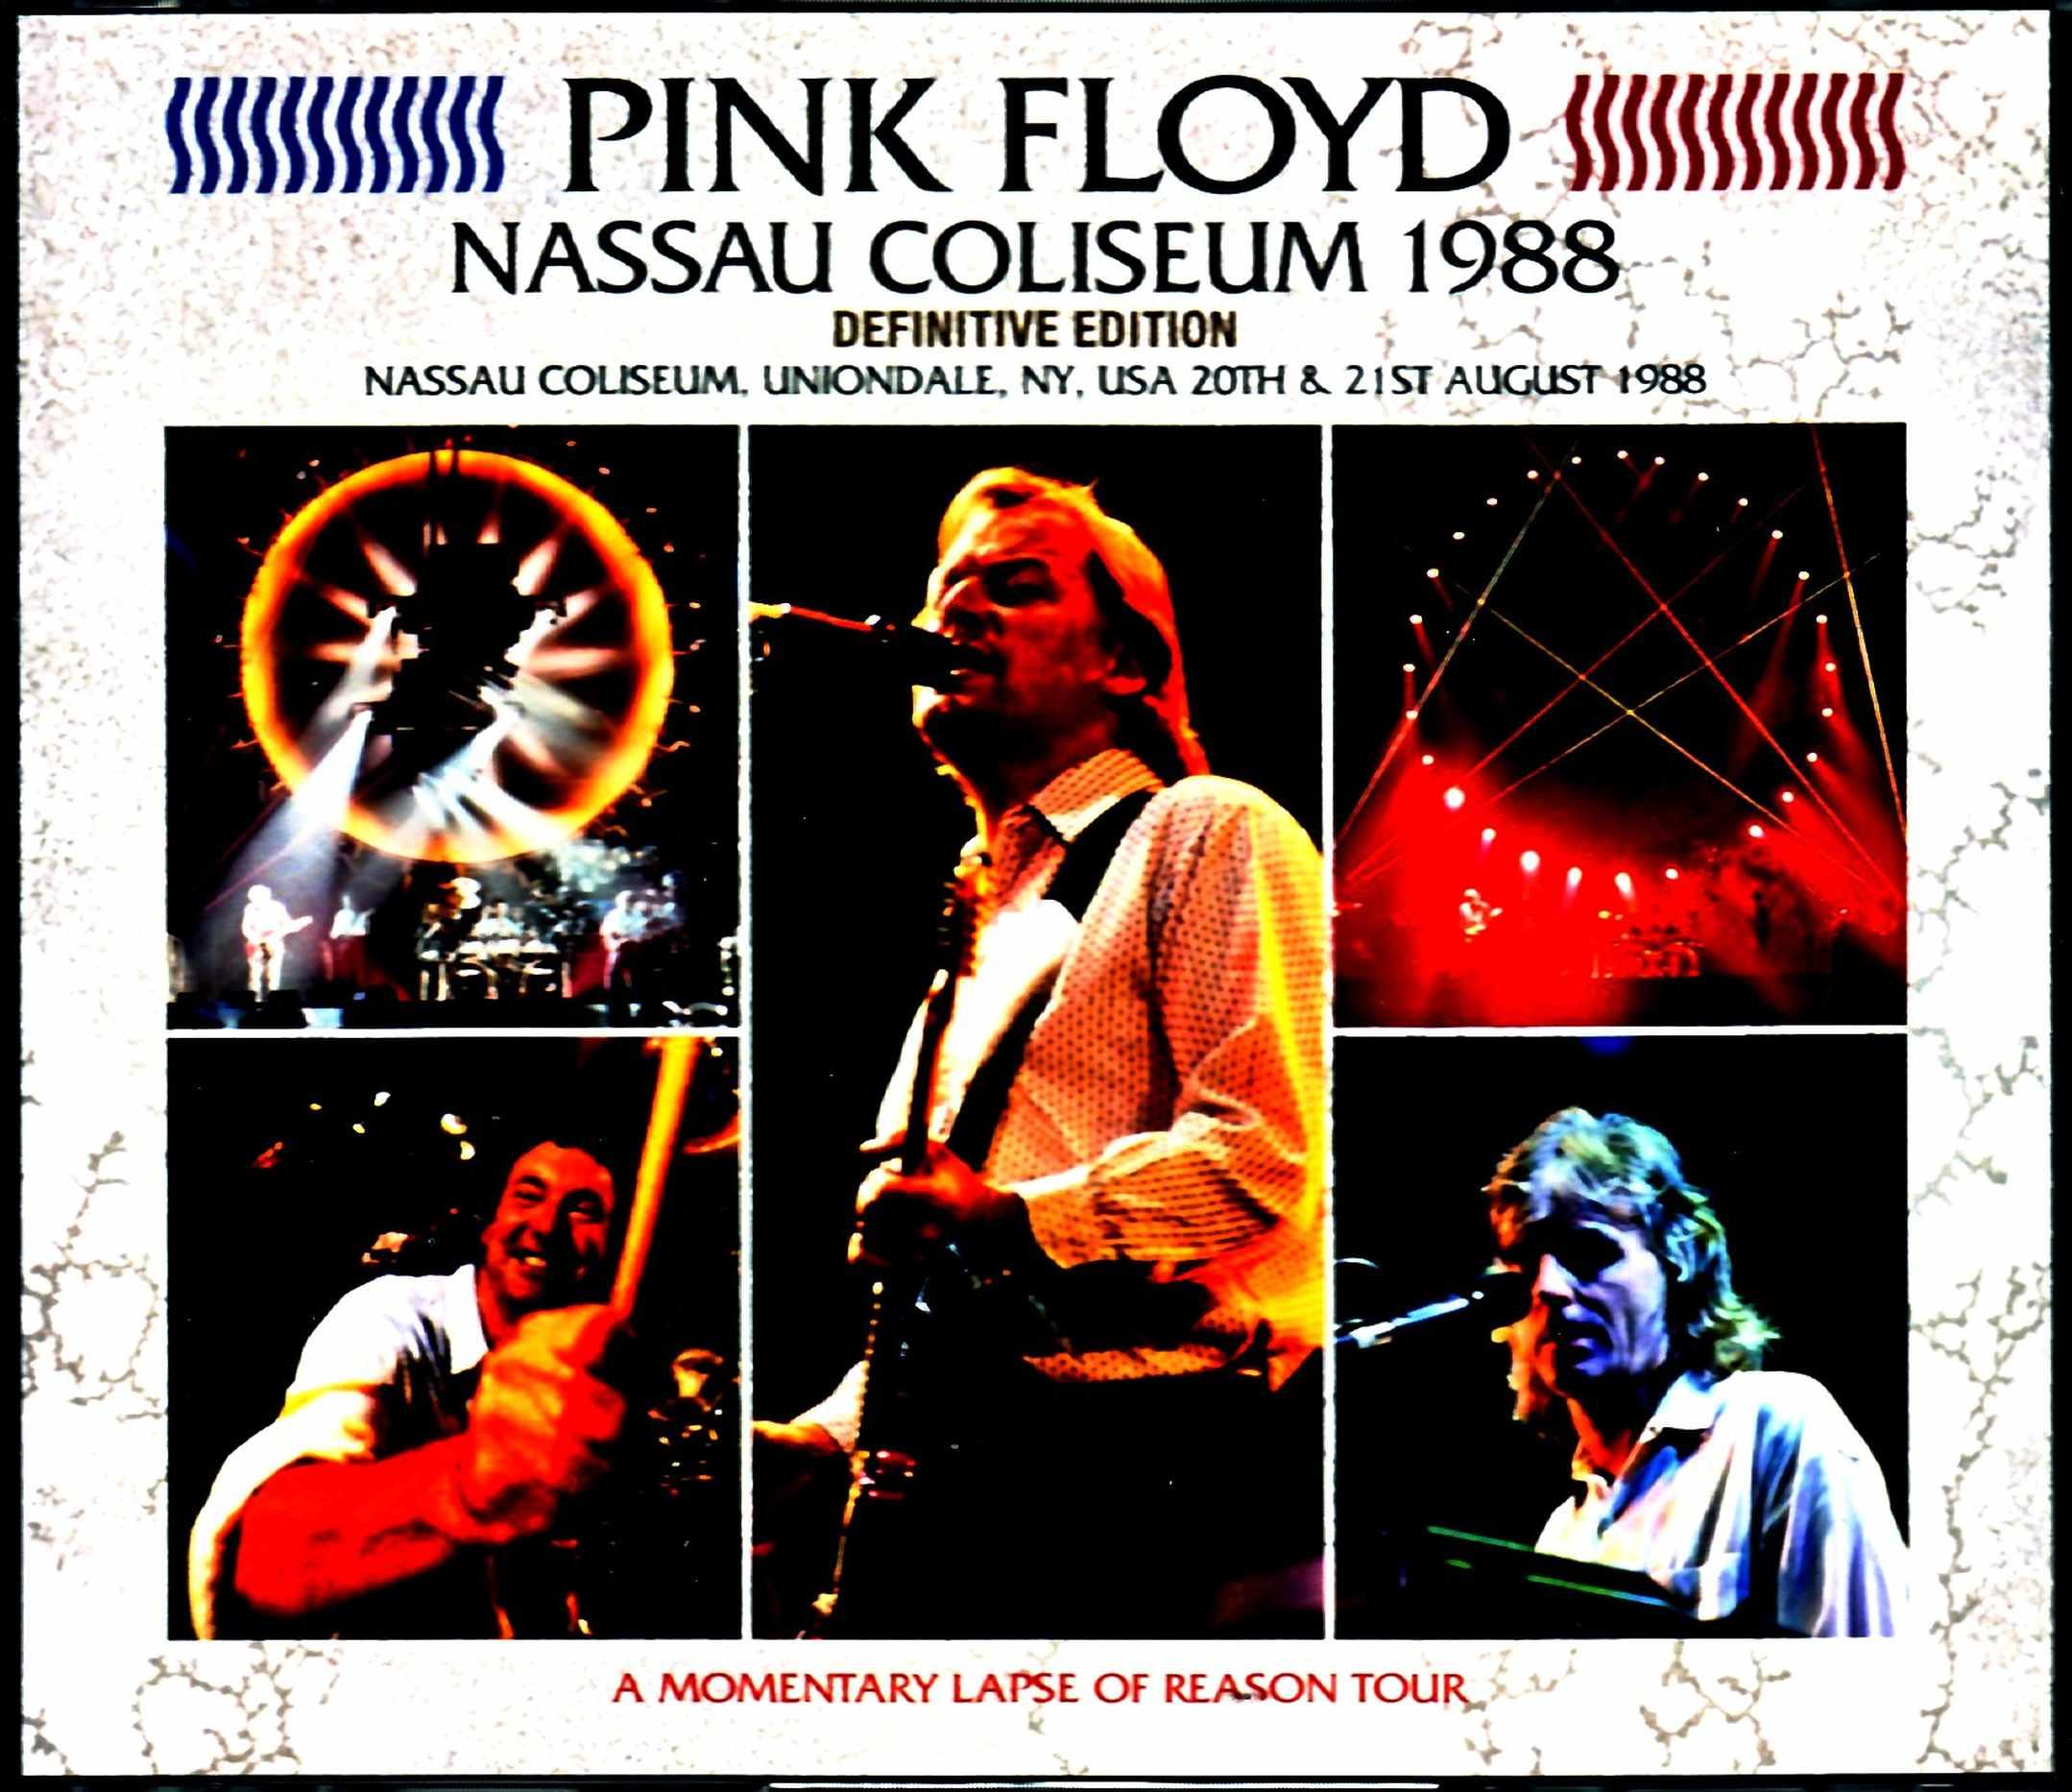 Pink Floyd ピンク・フロイド/NY,USA 1988 2Days Upgrade